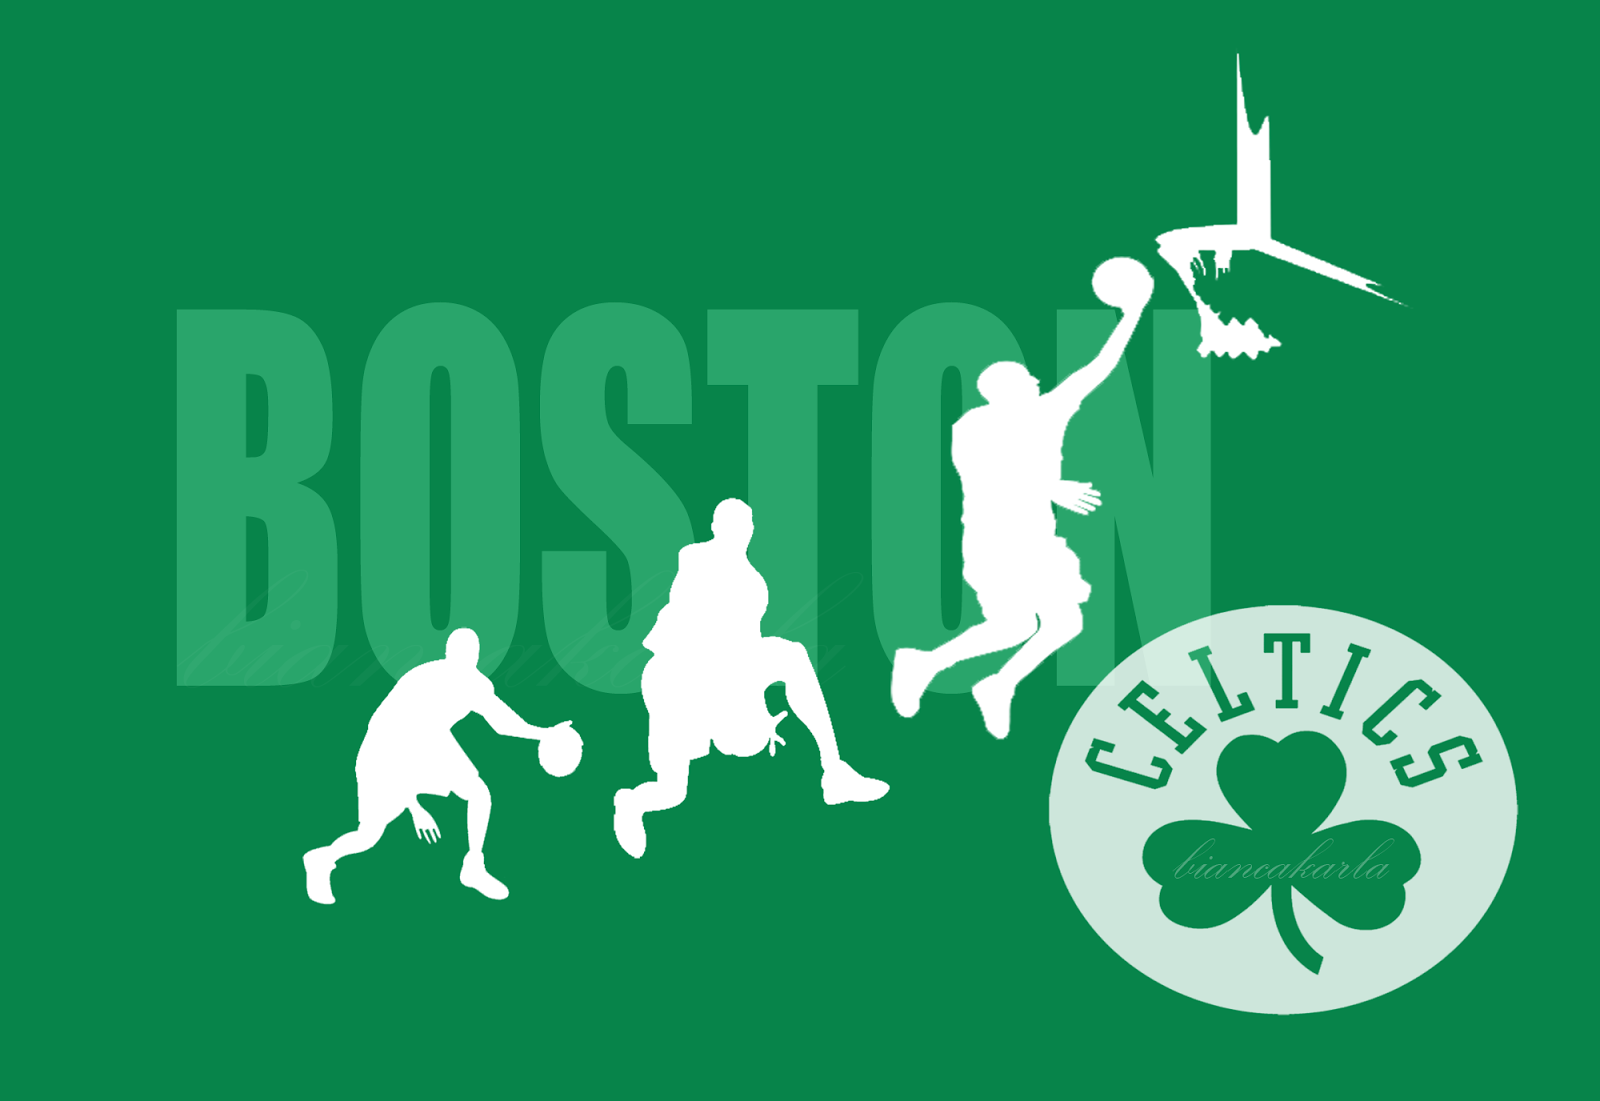 boston celtics logo nba team green wallpapers hd desktop background 1600x1101